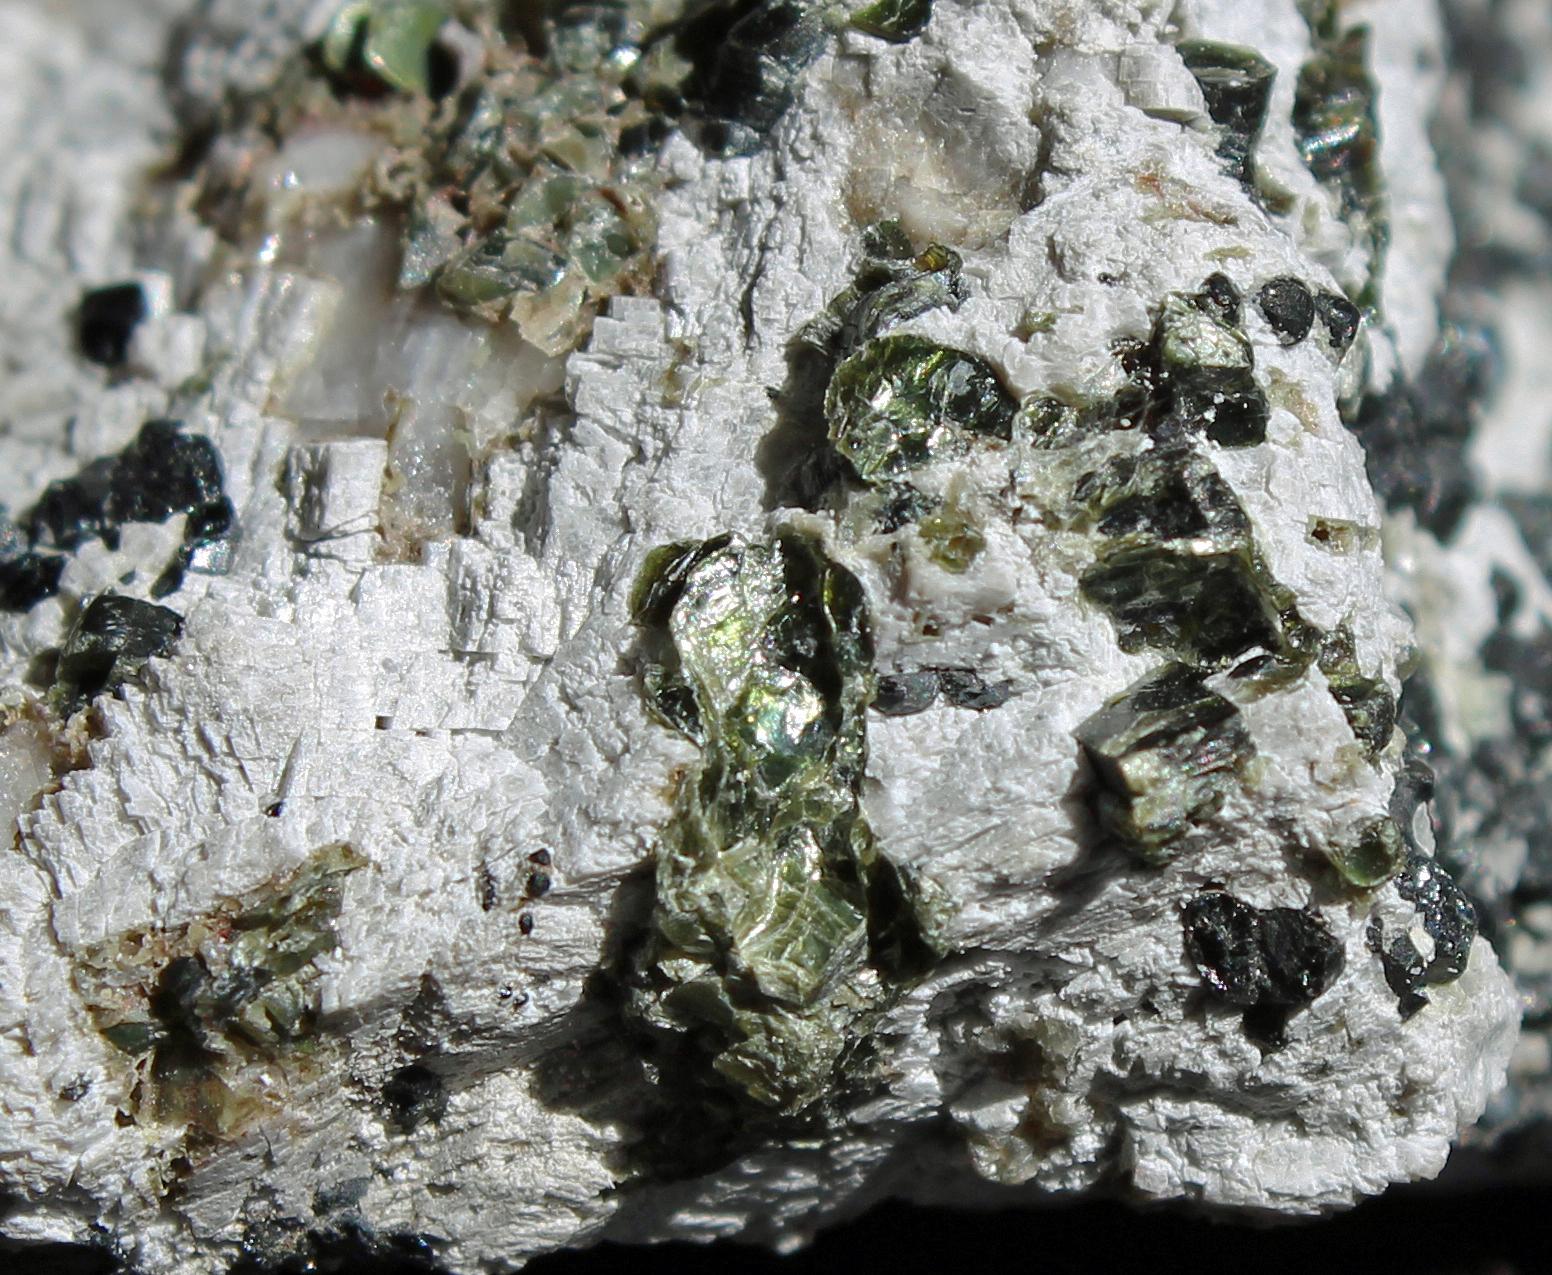 Clinochlore, dolomite, calcite, franklinite, Taylor Road Dump, image width 1 inch